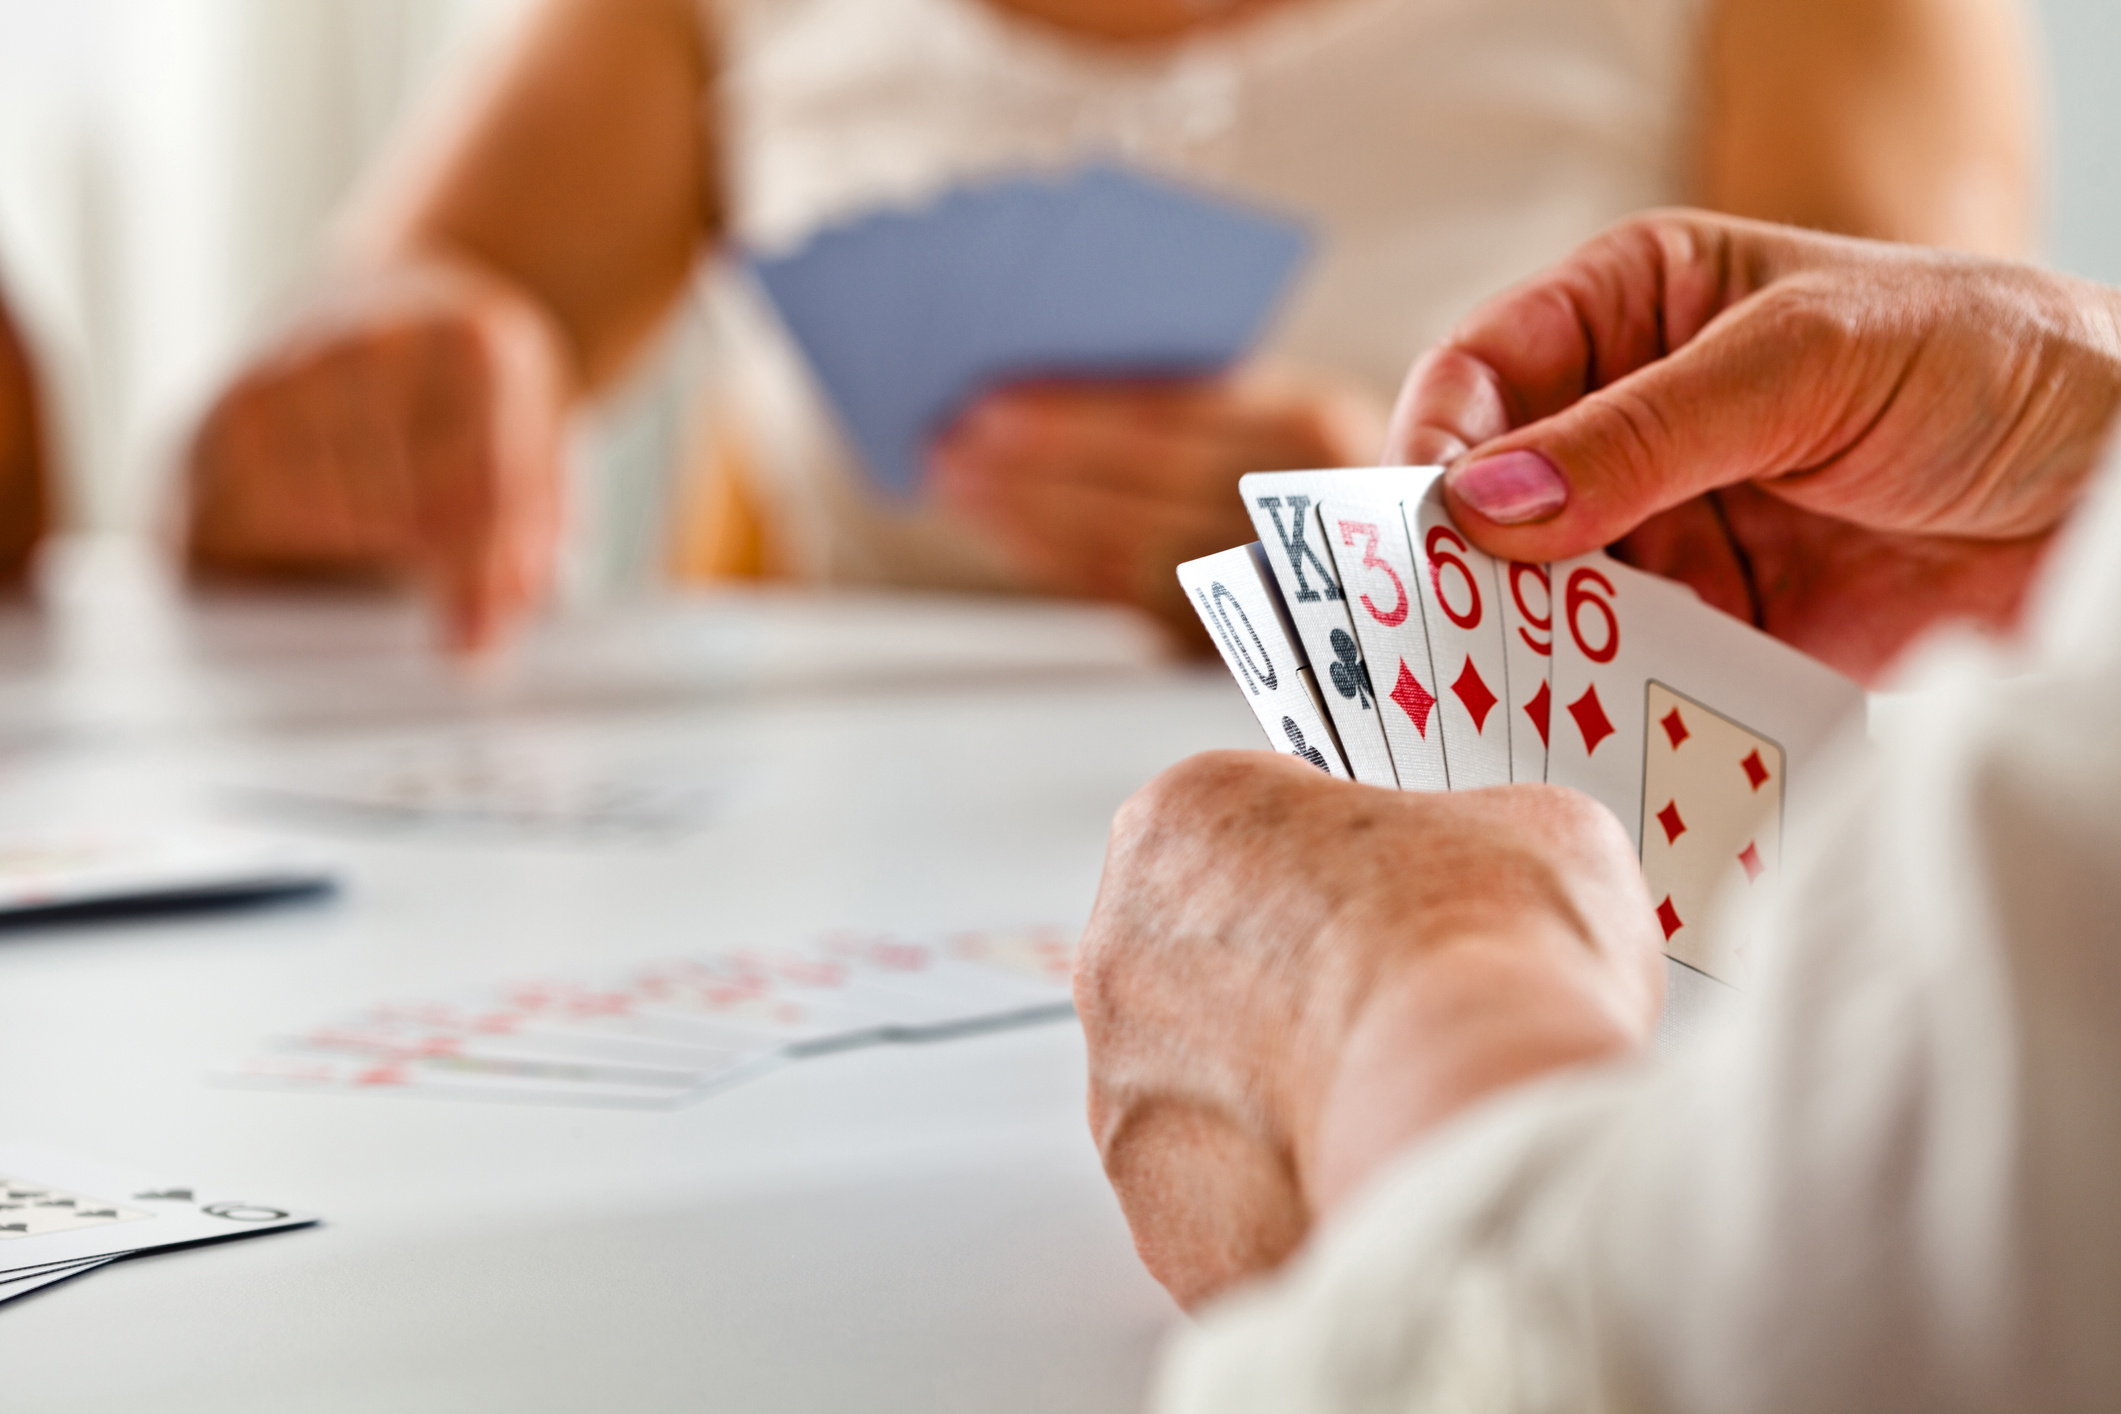 Cards-game-168630335_2122x1415.jpeg